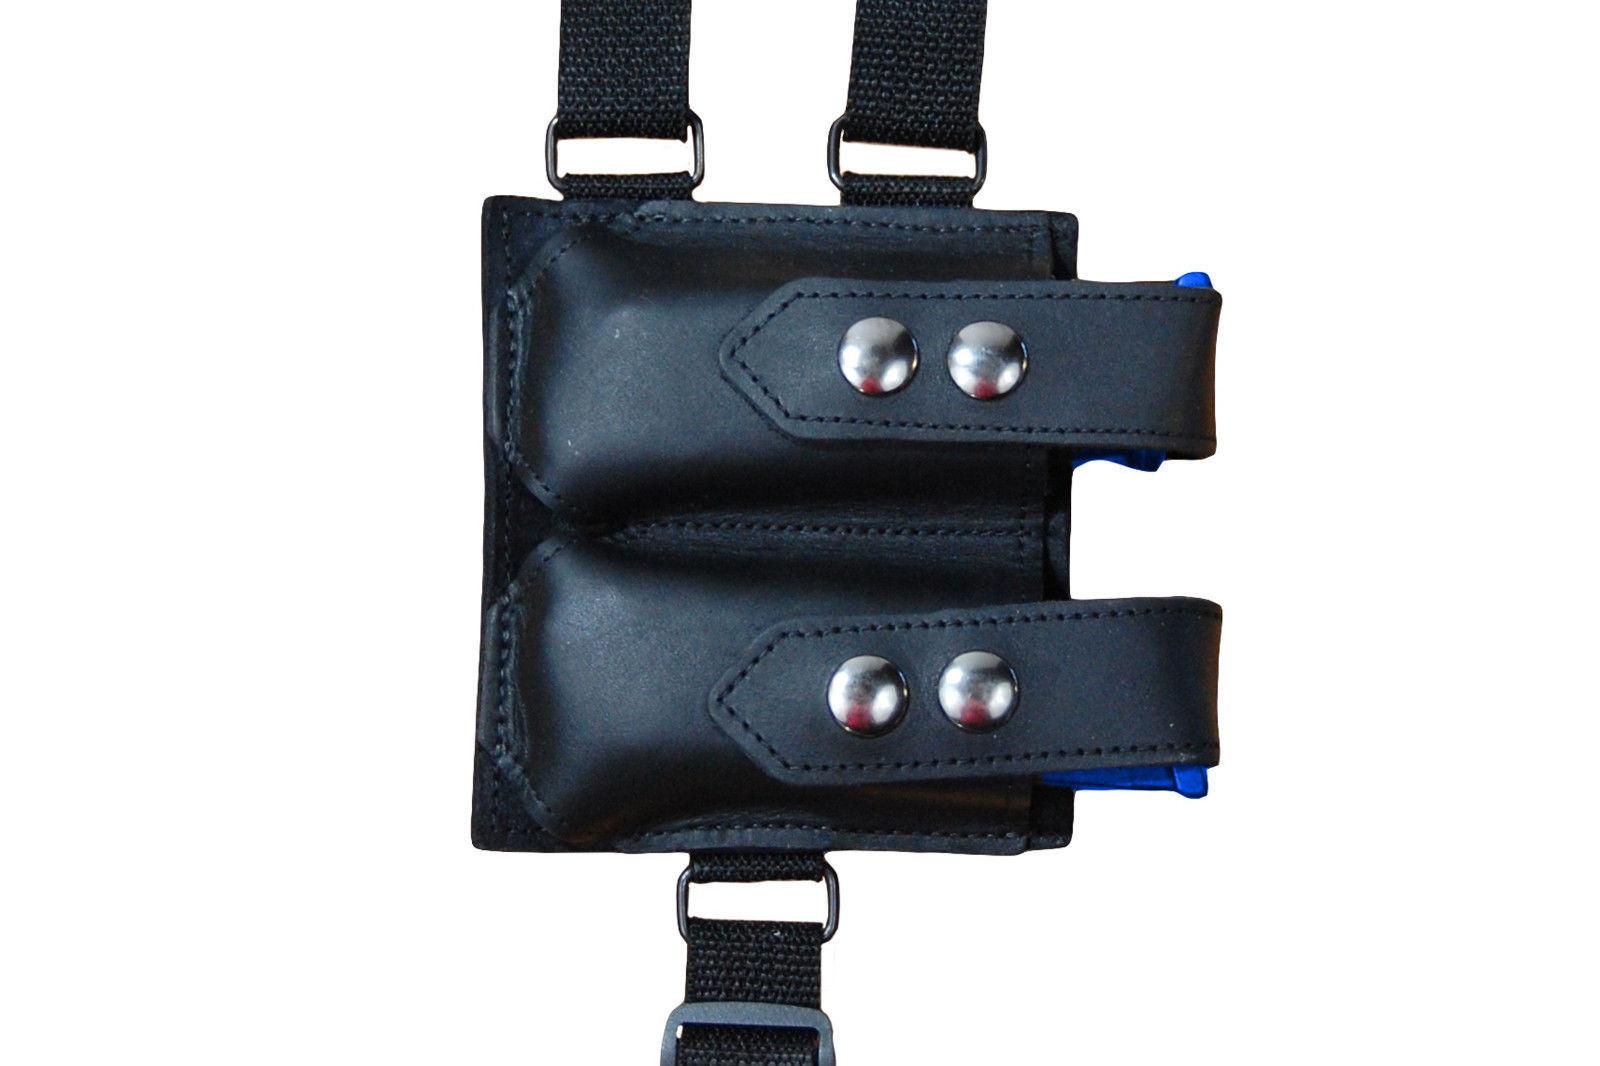 NEW Barsony Black Leather Shoulder Holster Dbl Mag Pouch Taurus Millennium LASER